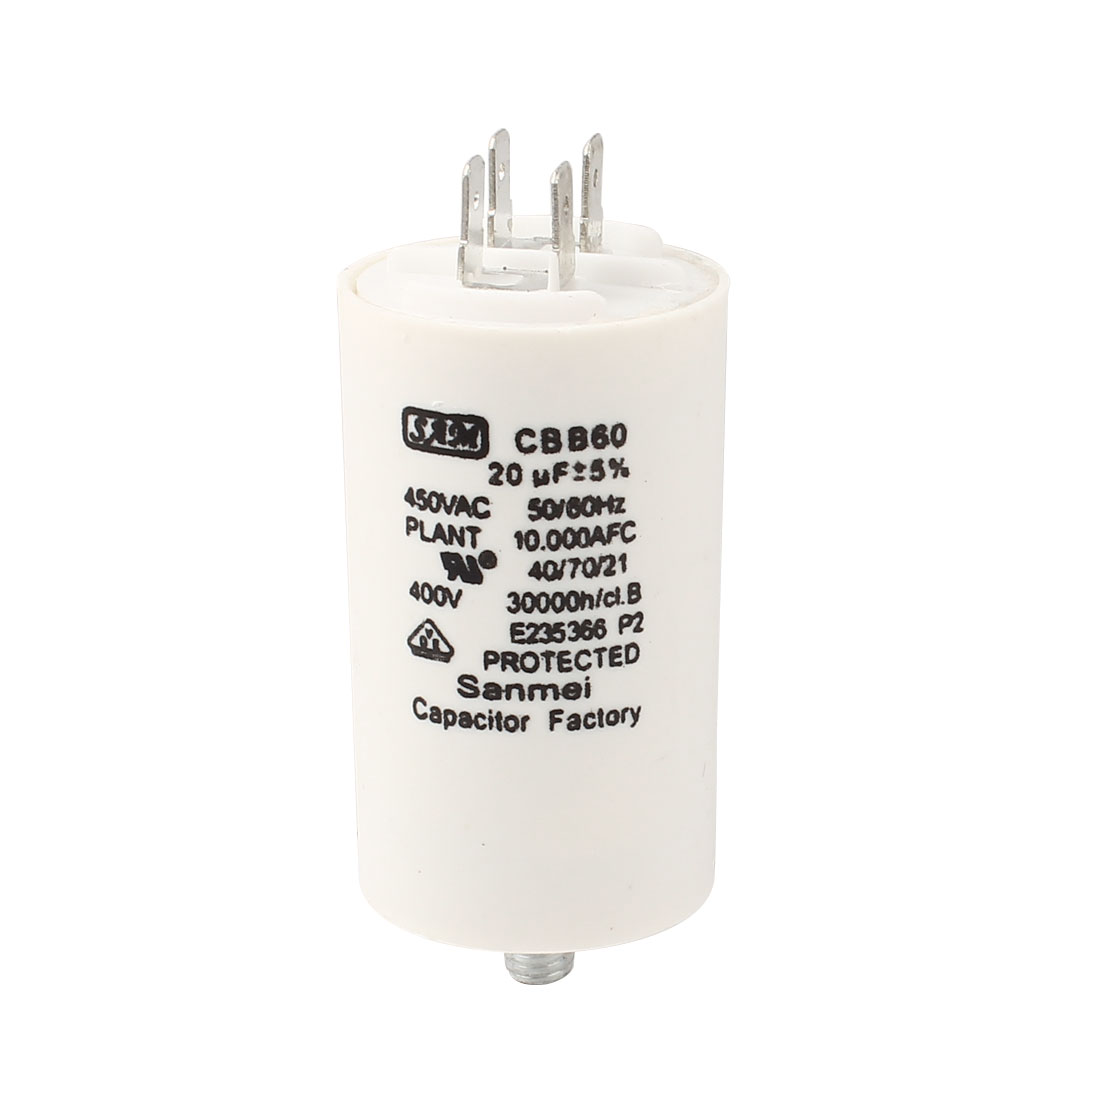 CBB60 Thread Rod Phase AC Motor Running Capacitor 450V 20uF